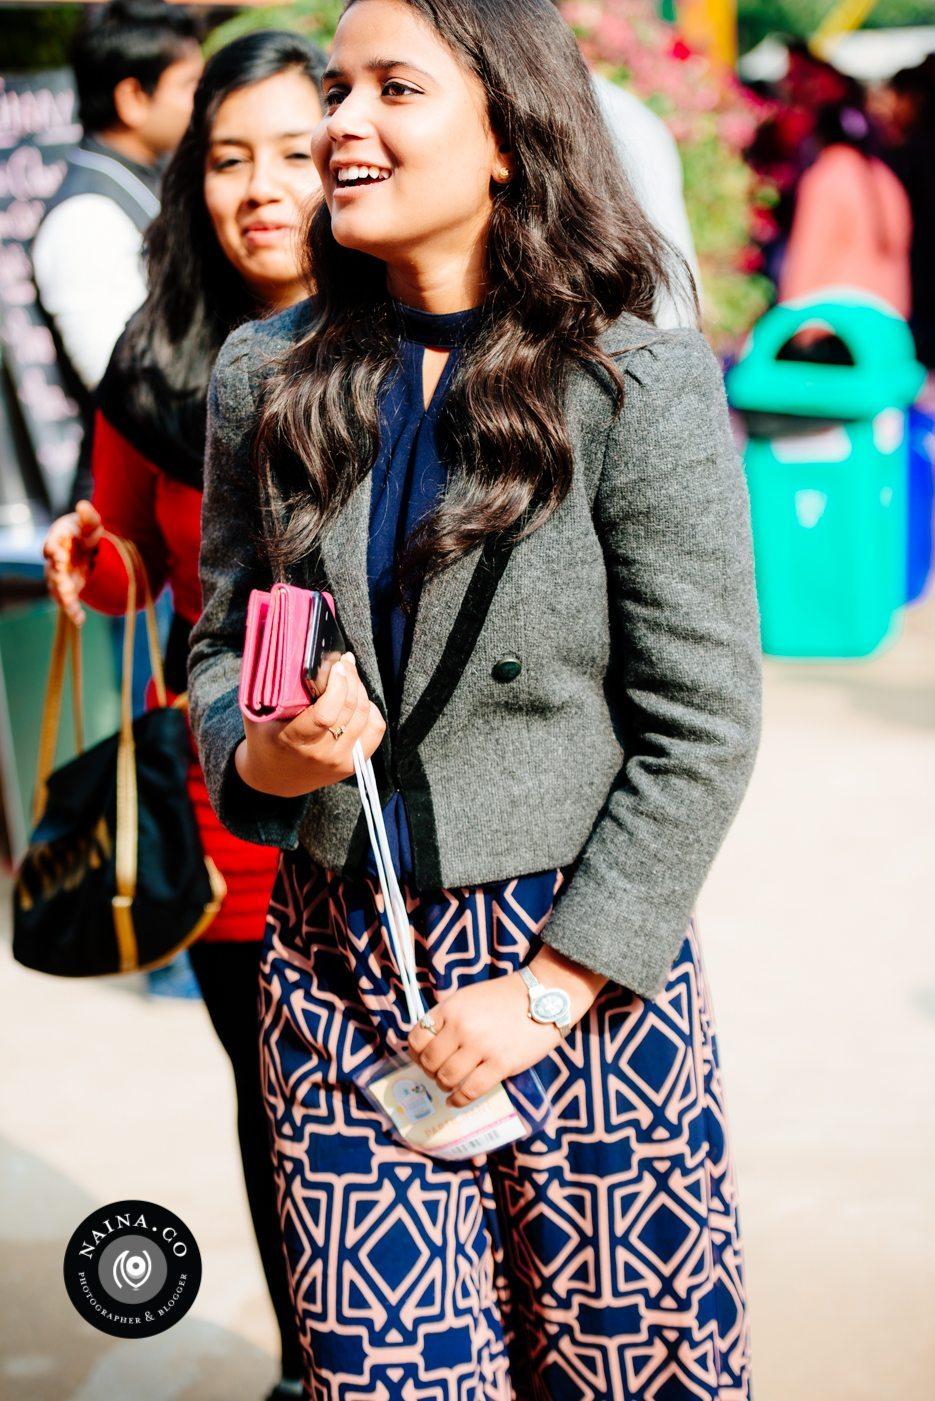 Naina.co-Raconteuse-Visuelle-Photographer-Blogger-Storyteller-Luxury-Lifestyle-January-2015-Jaipur-Literature-Festival-StRegis-LeMeridien-ZeeJLF-EyesForStreetStyle-39